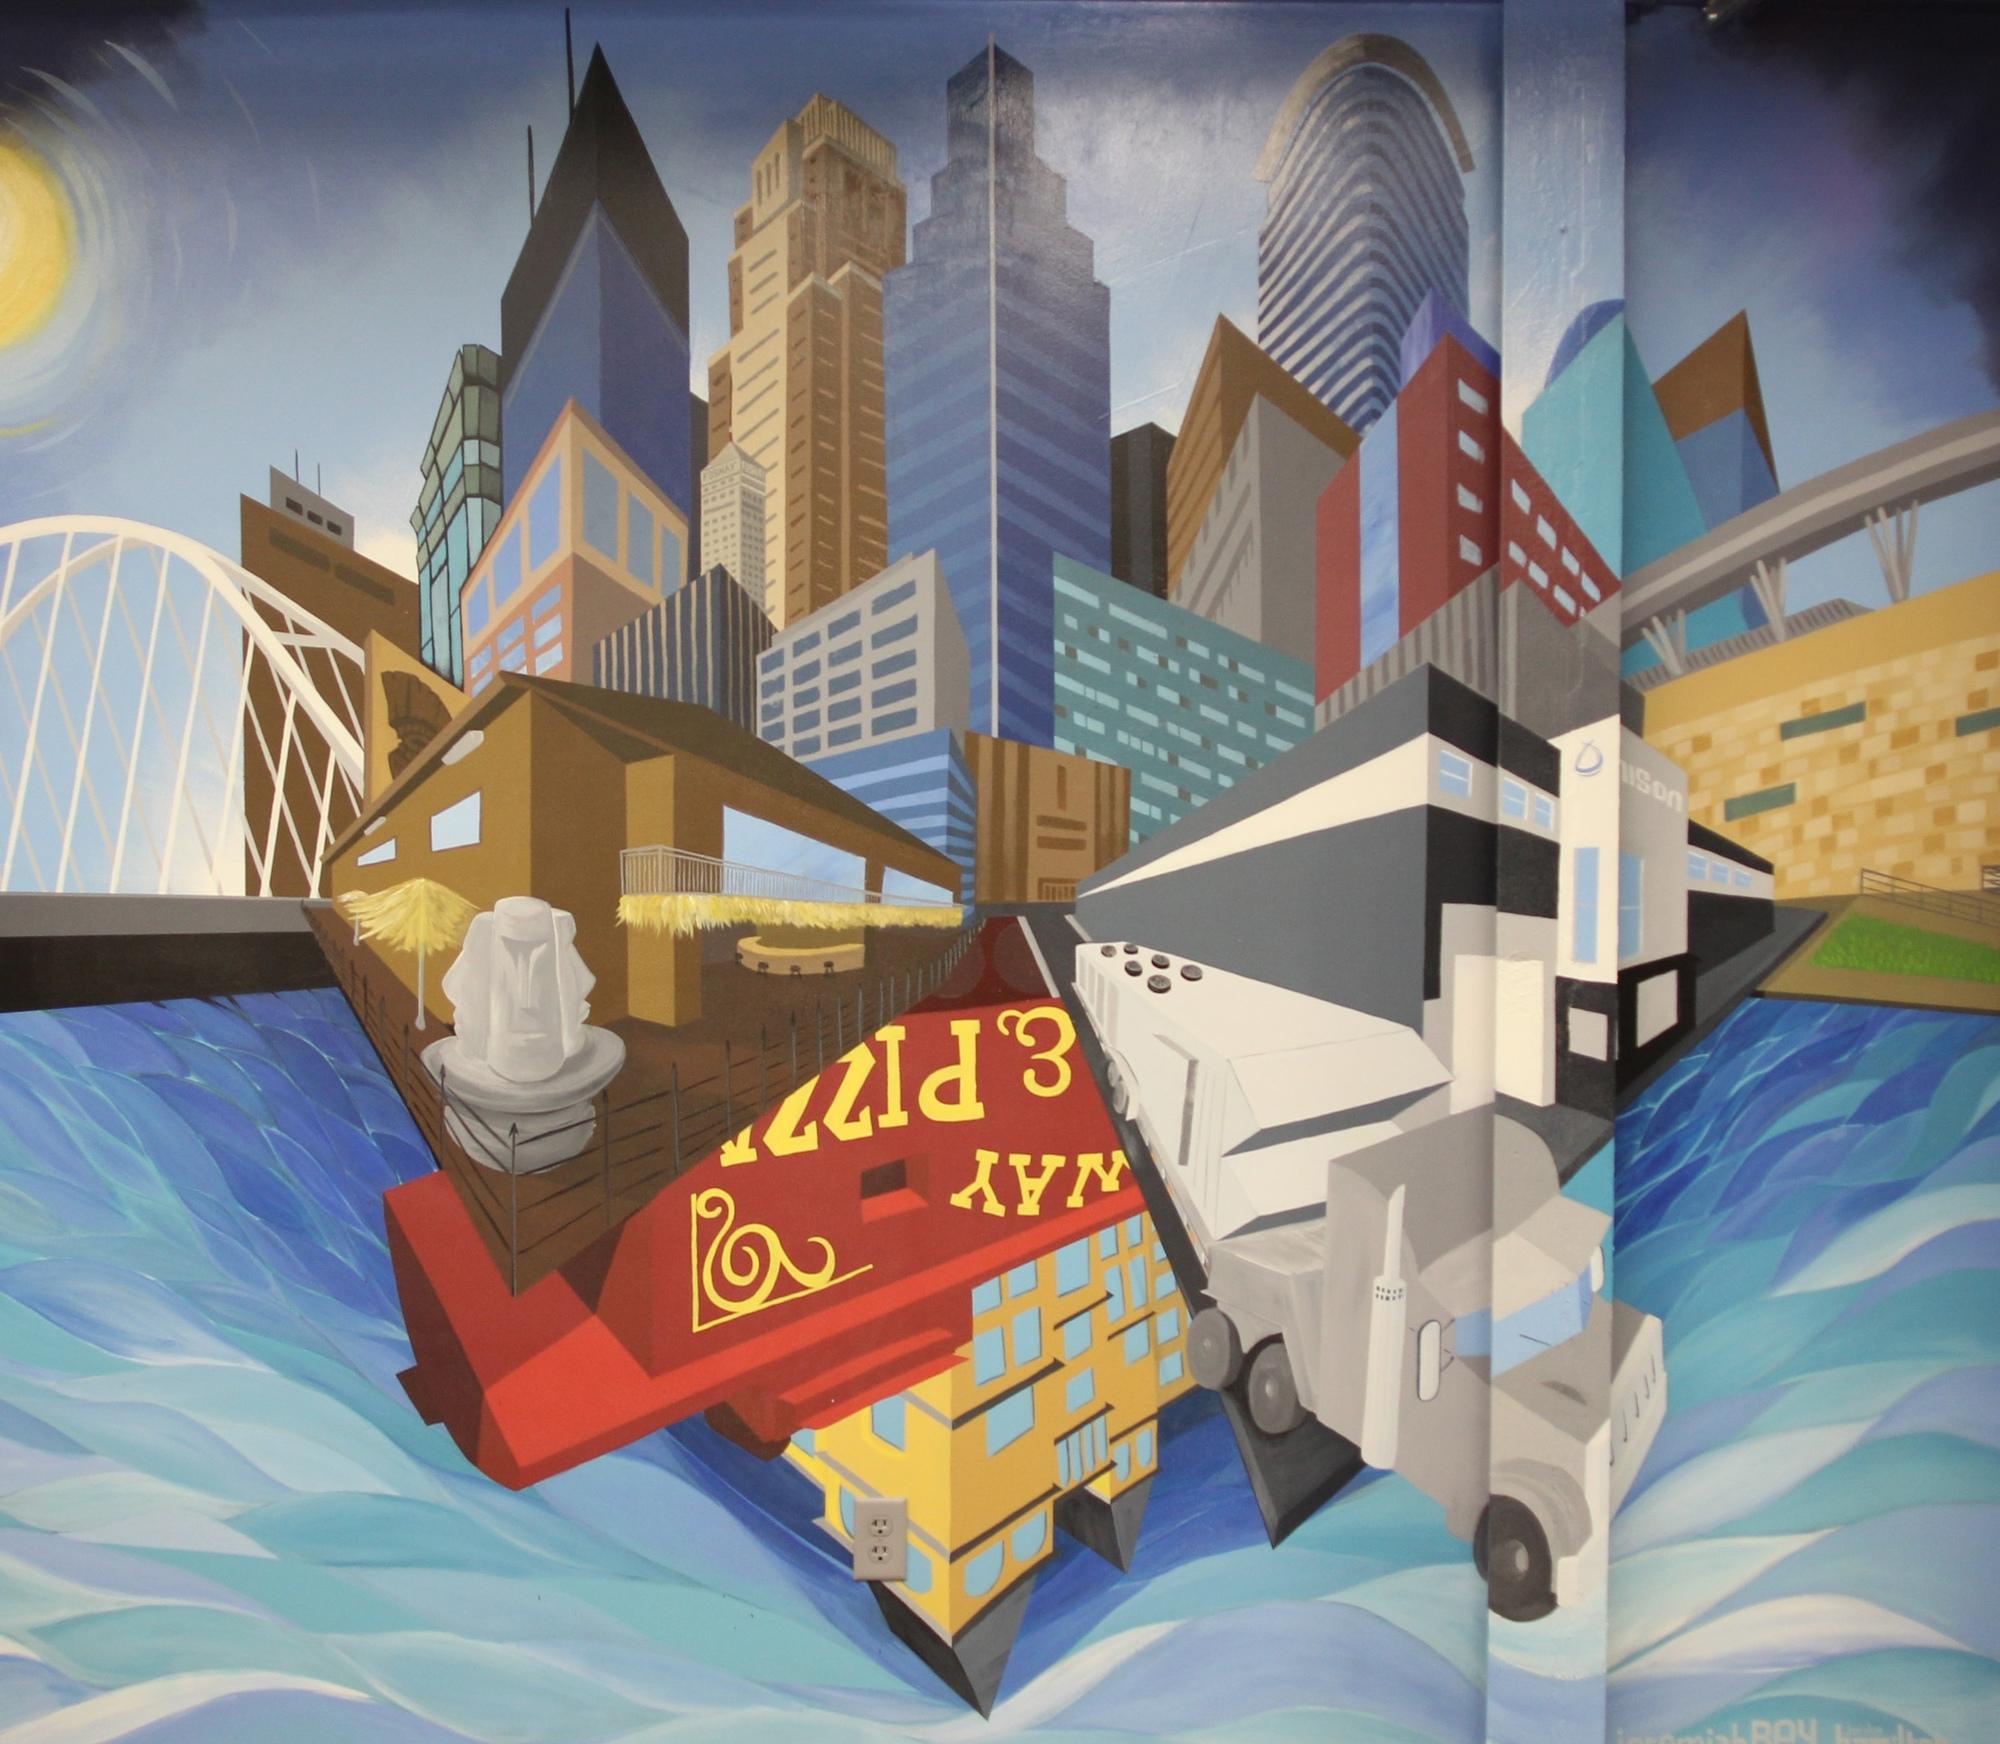 Unison mural